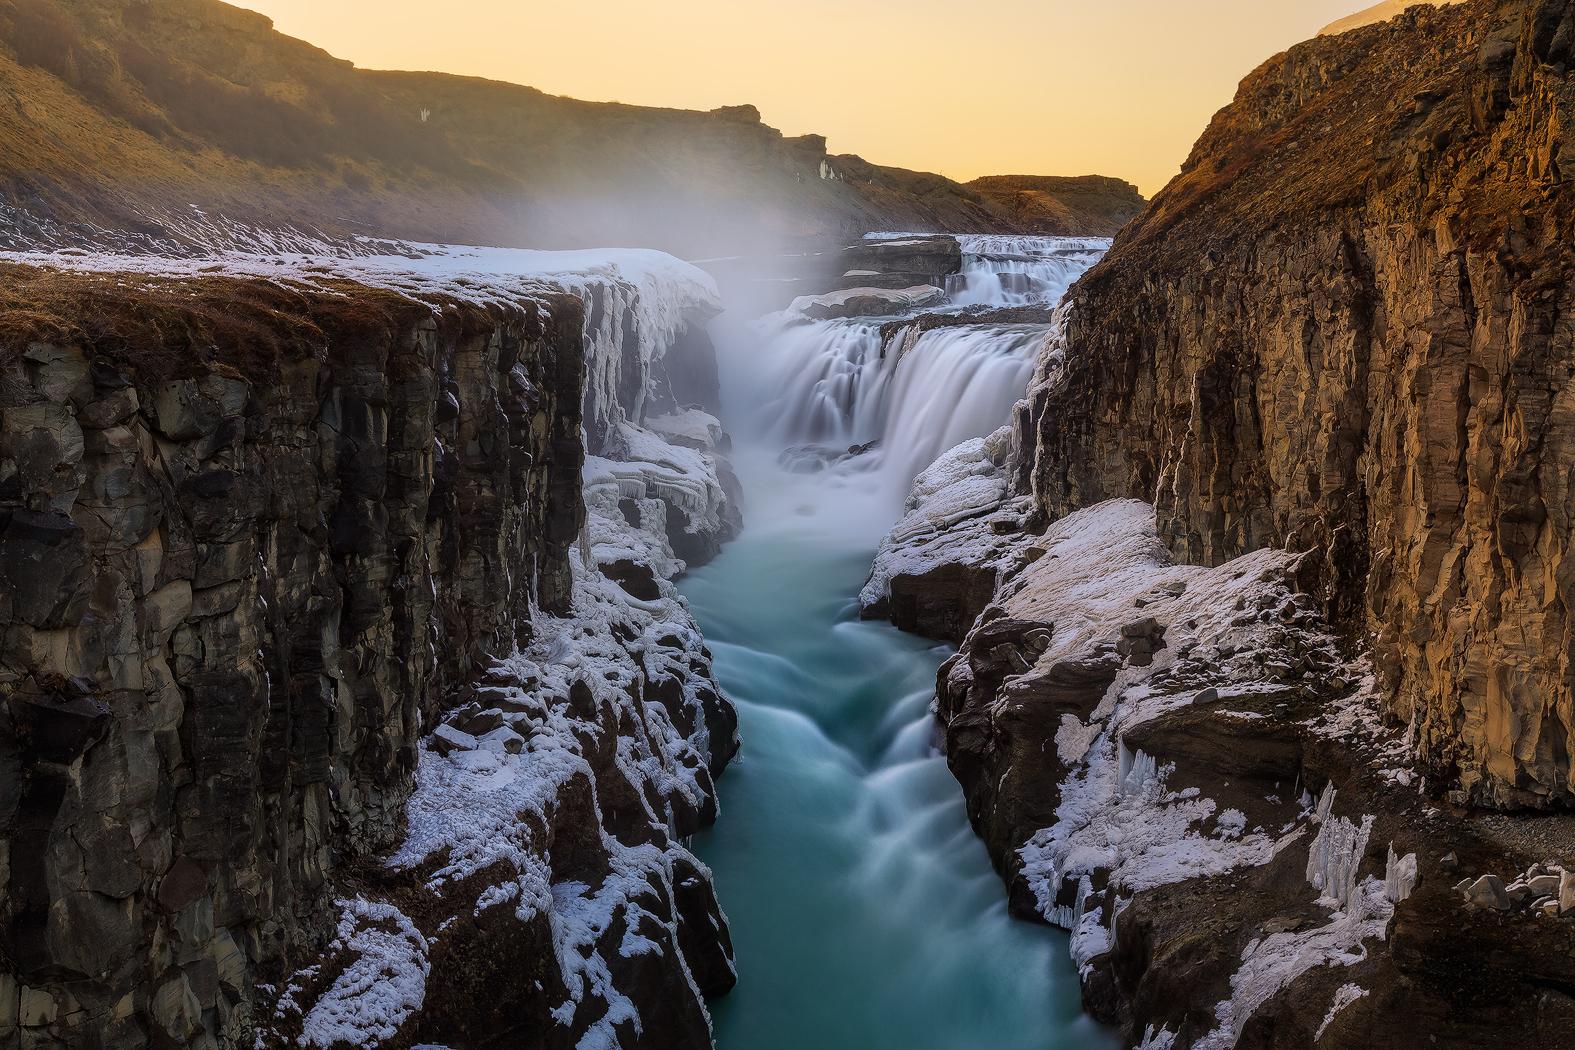 Gullfoss-waterval tuimelt in twee enorme etappes de diepe canyon in.